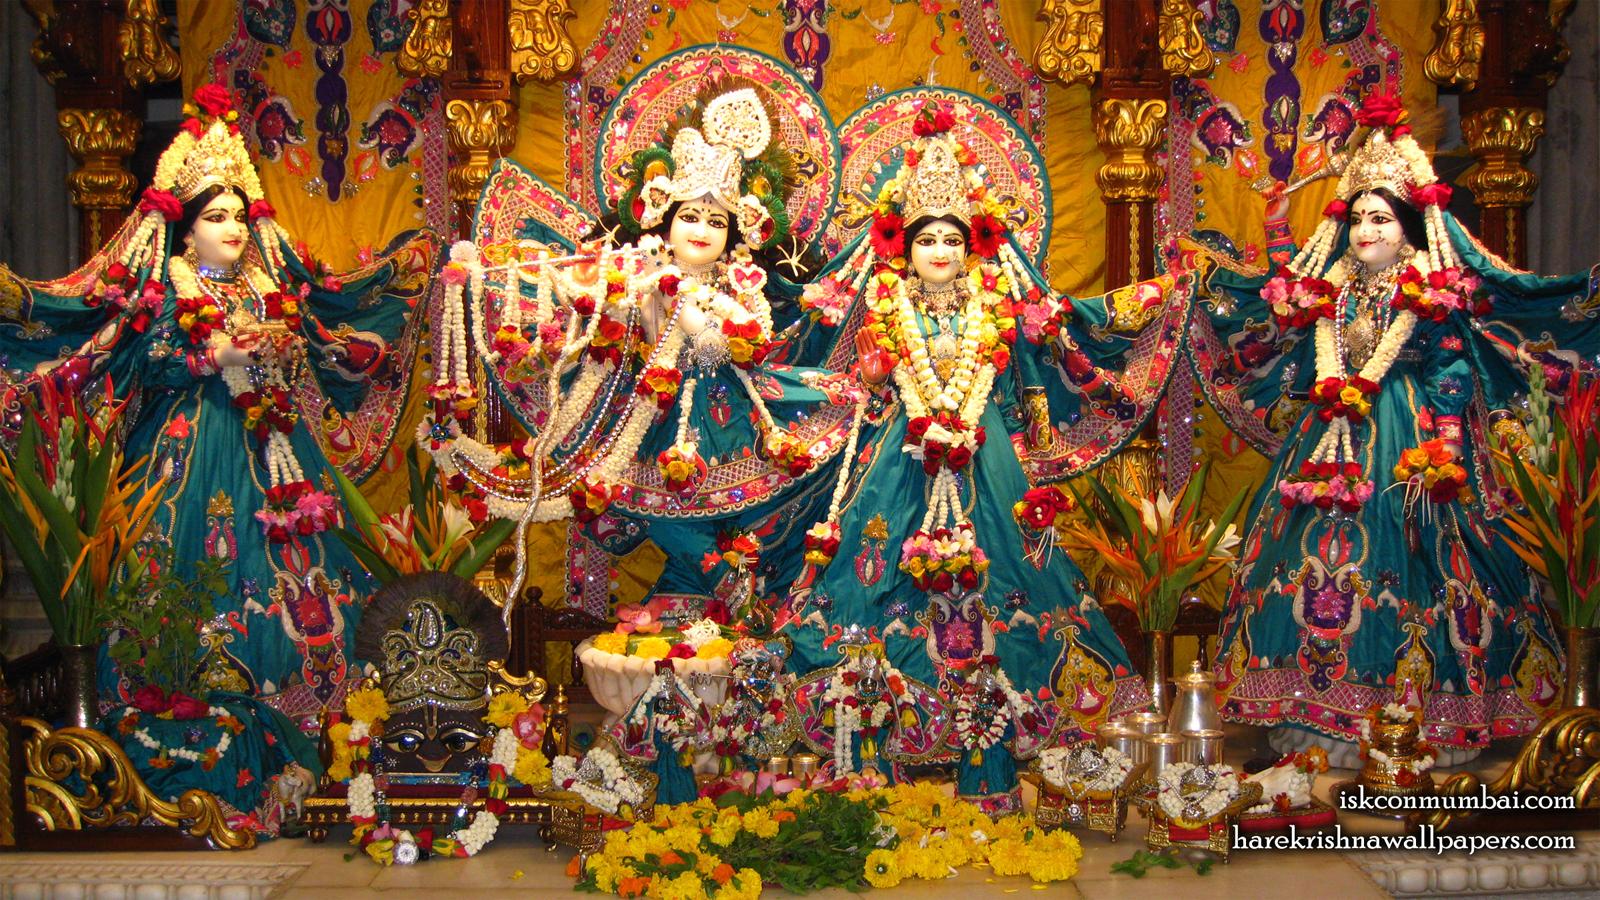 Sri Sri Radha Rasabihari Lalita Vishakha Wallpaper (003) Size 1600x900 Download